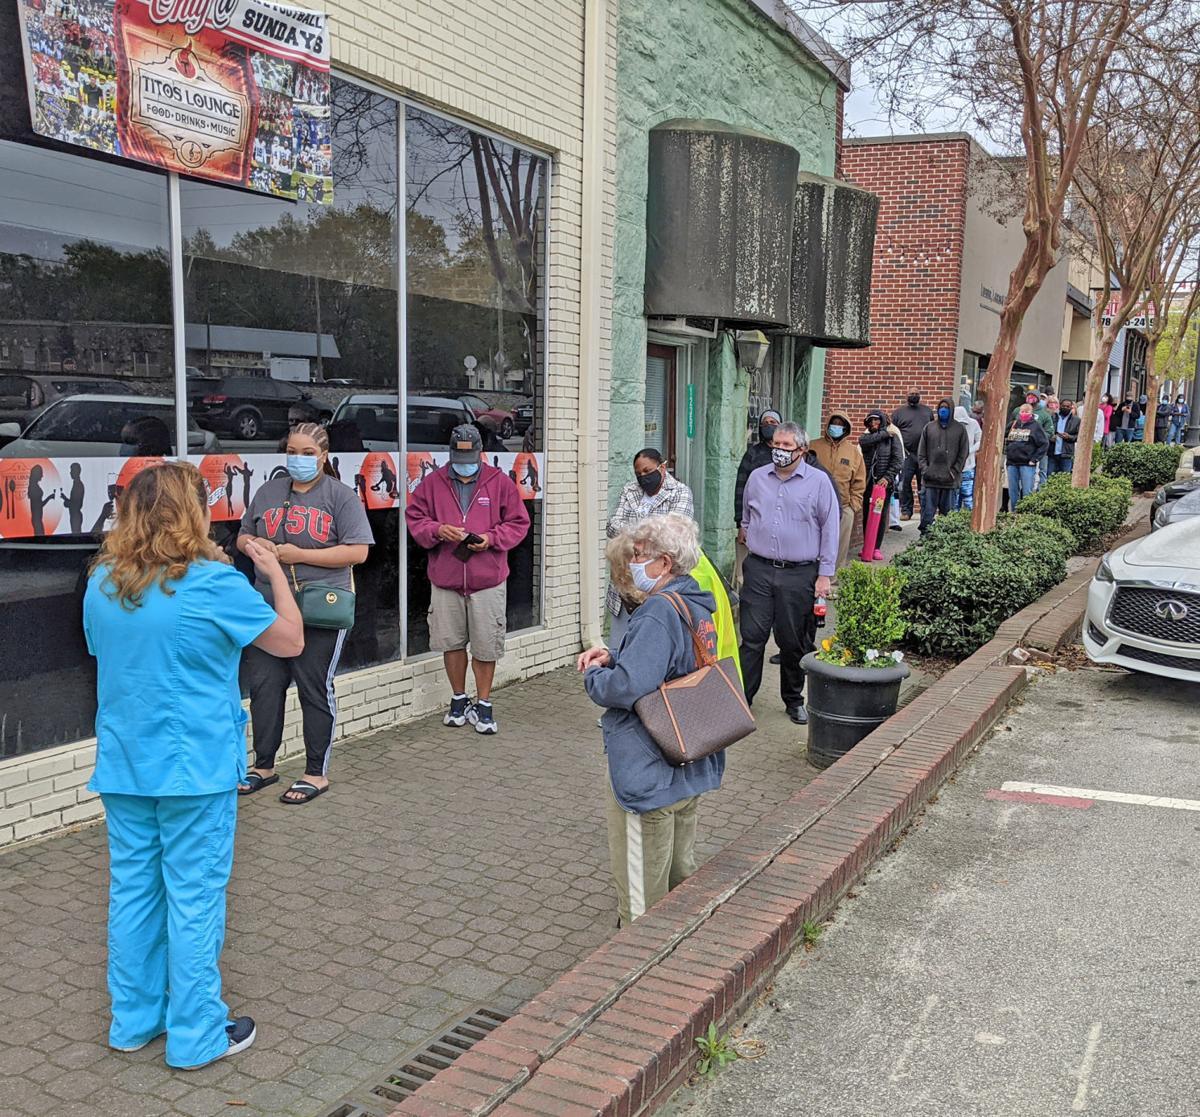 Premier, Tito's, councilman team to bring walk-up shots to Douglasville